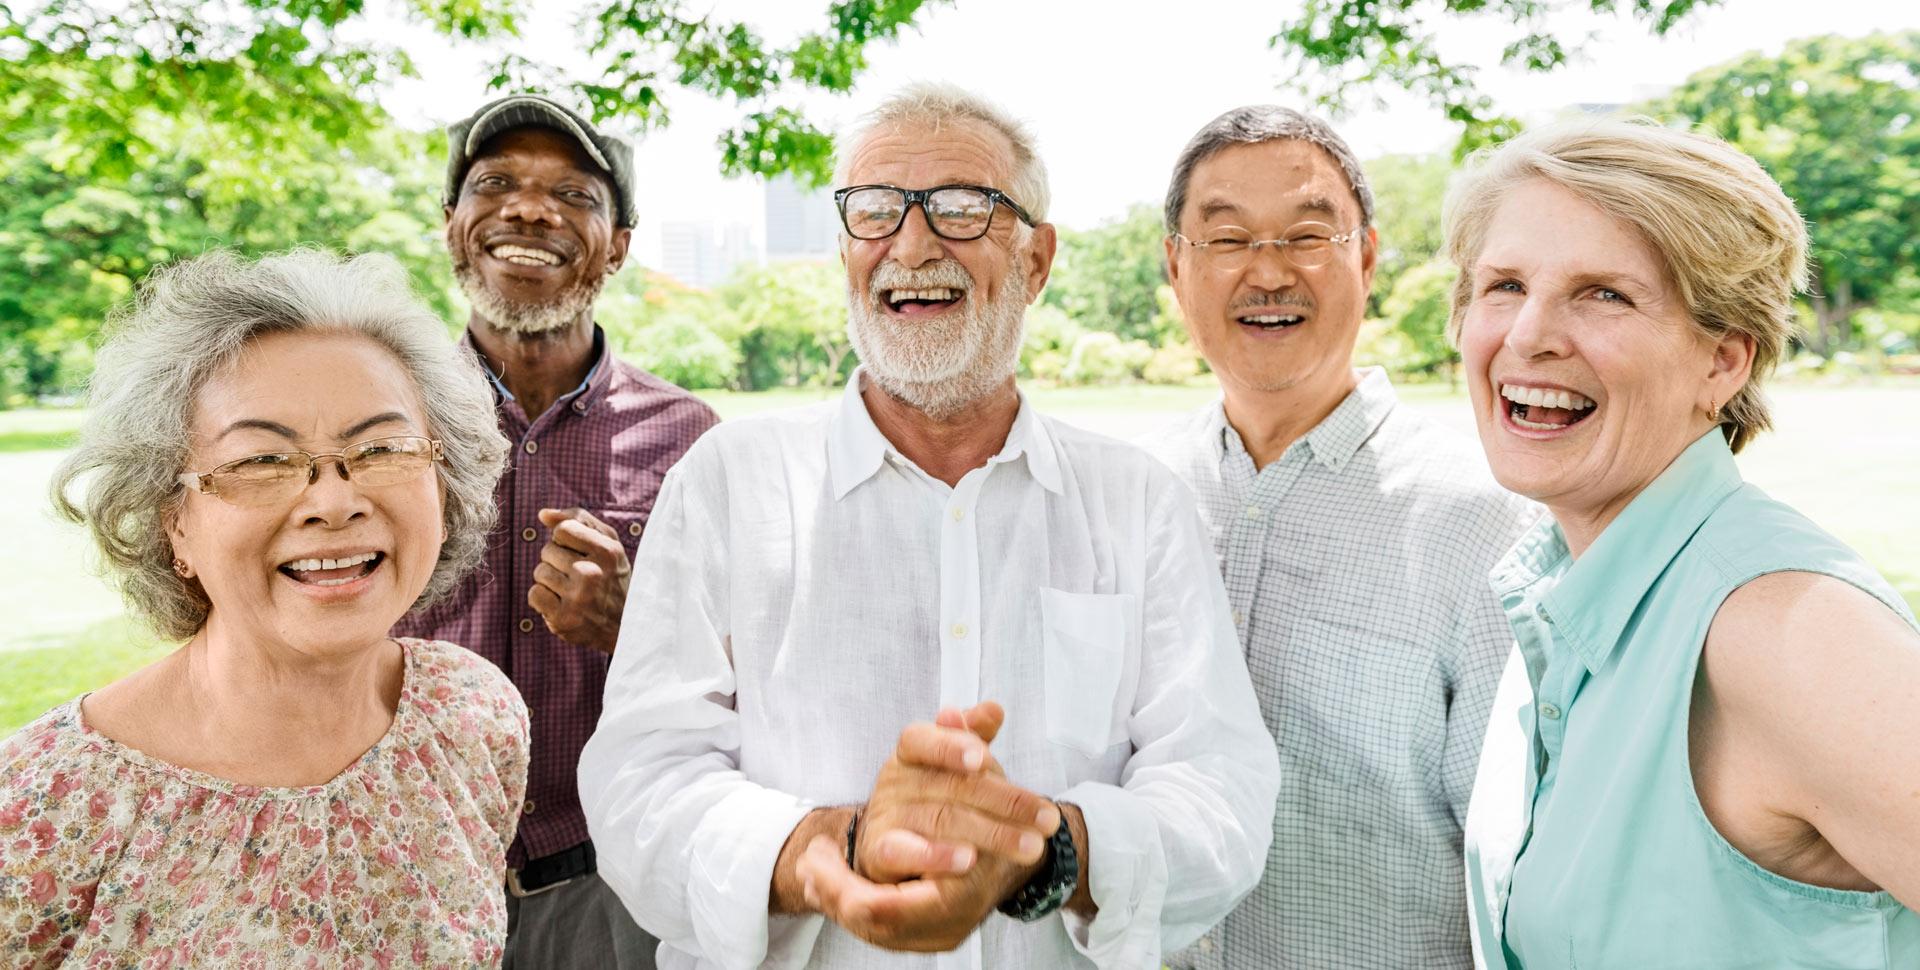 Top 5 Reasons Why Seniors Choose CBD - Top 5 Reasons Why Seniors Choose CBD